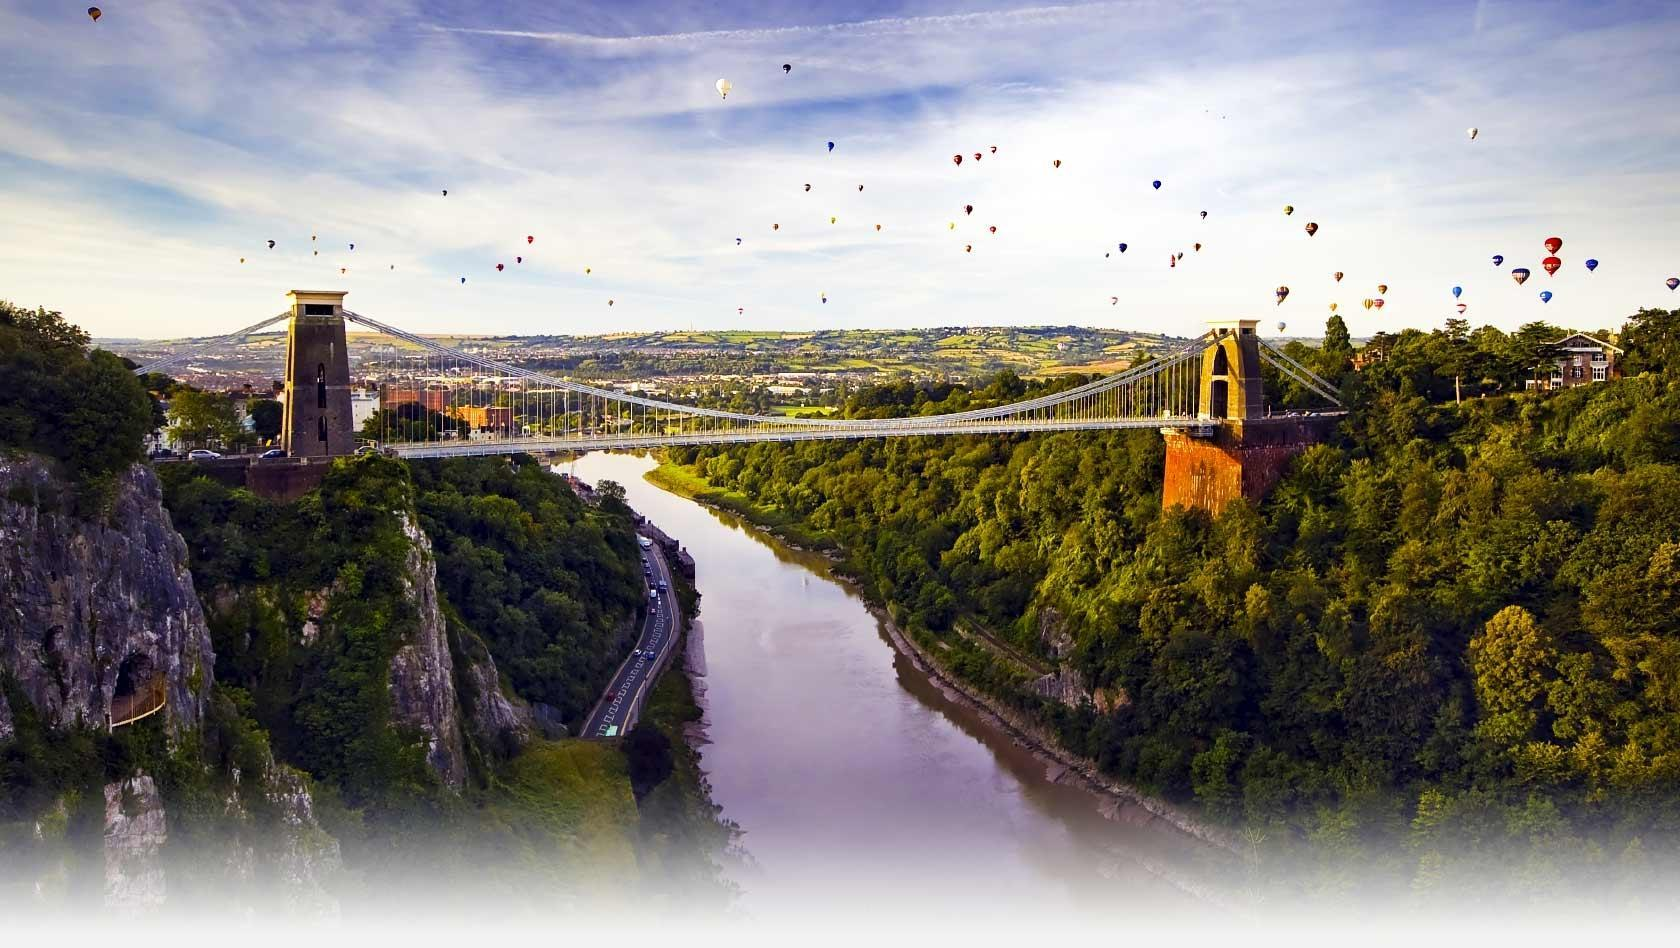 Cinque motivi per visitare Bristol